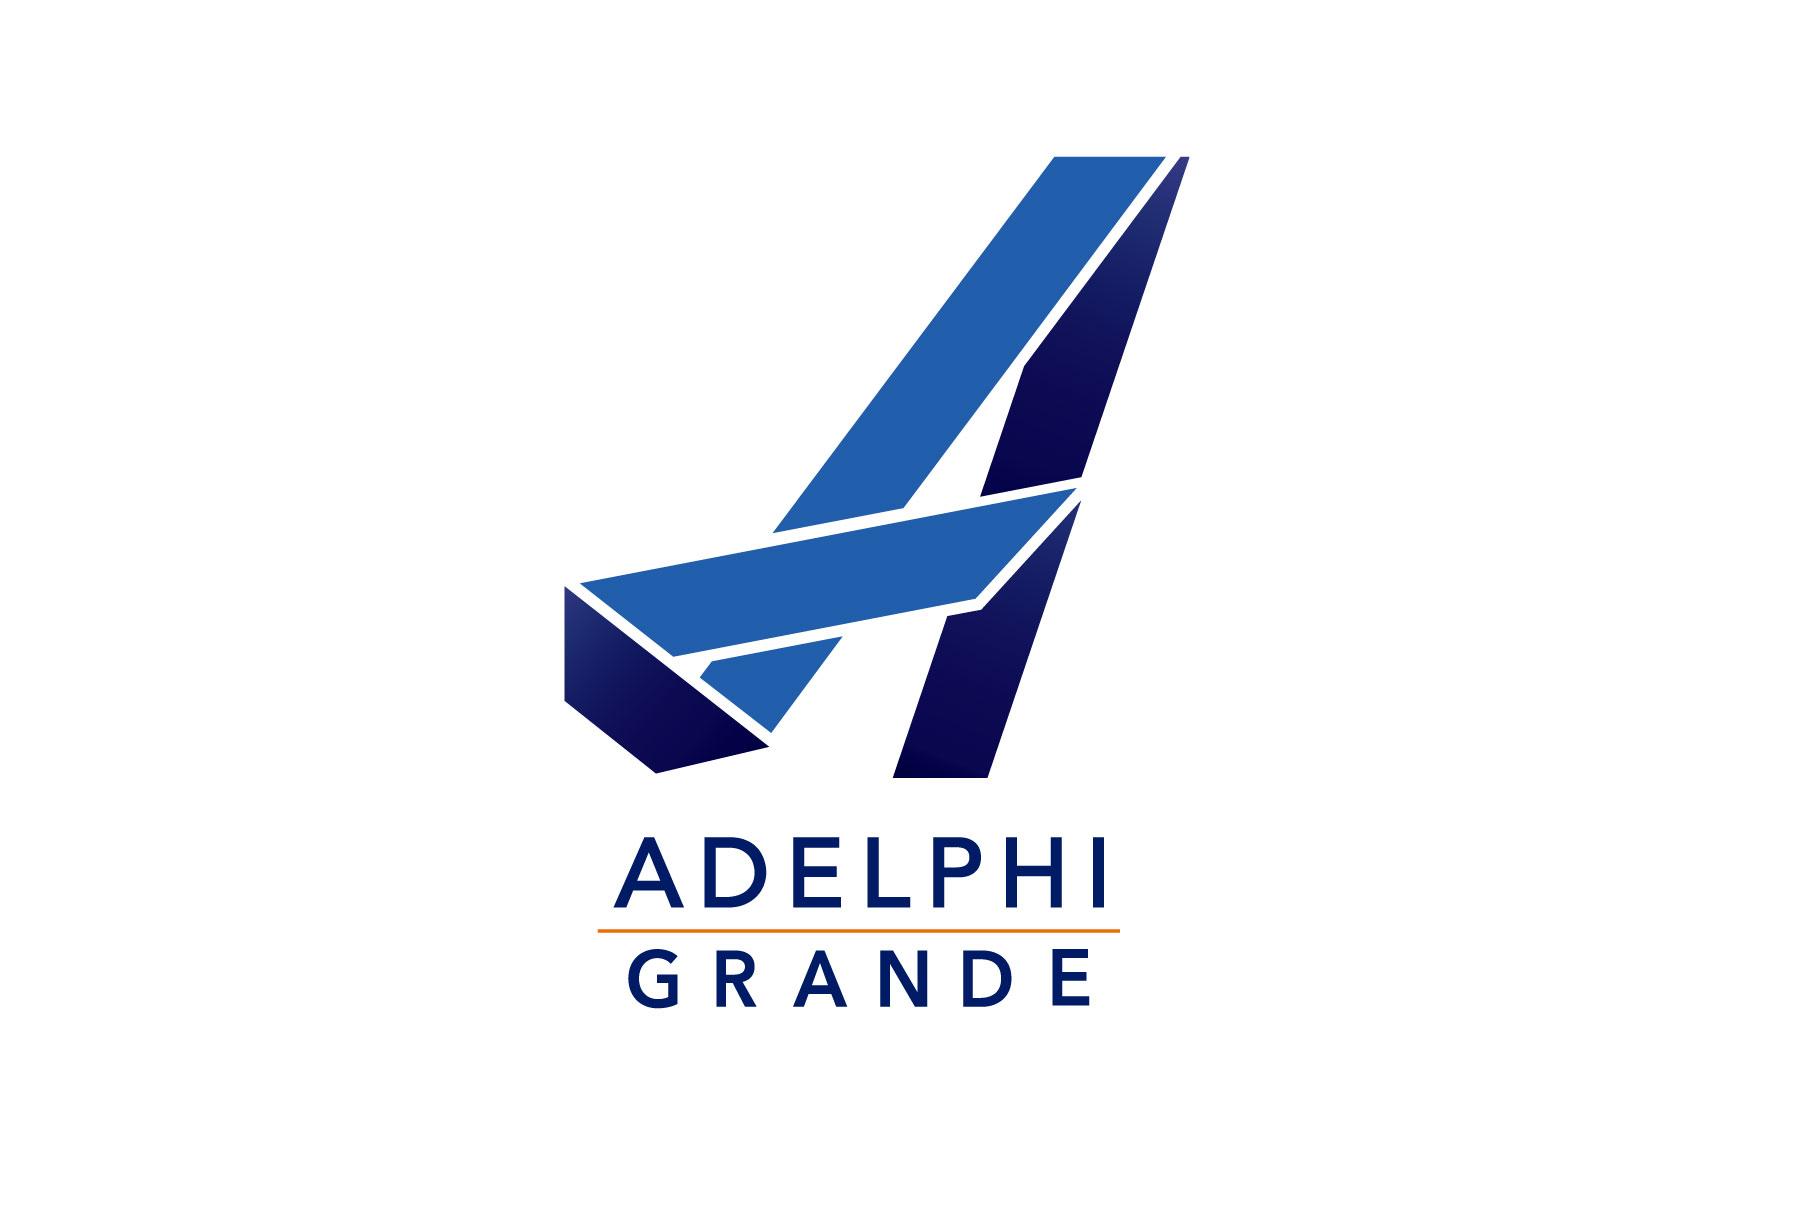 ADELPHI GRANDE SUKHUMVIT BANGKOK HOTEL & SERVICE APARTMENT